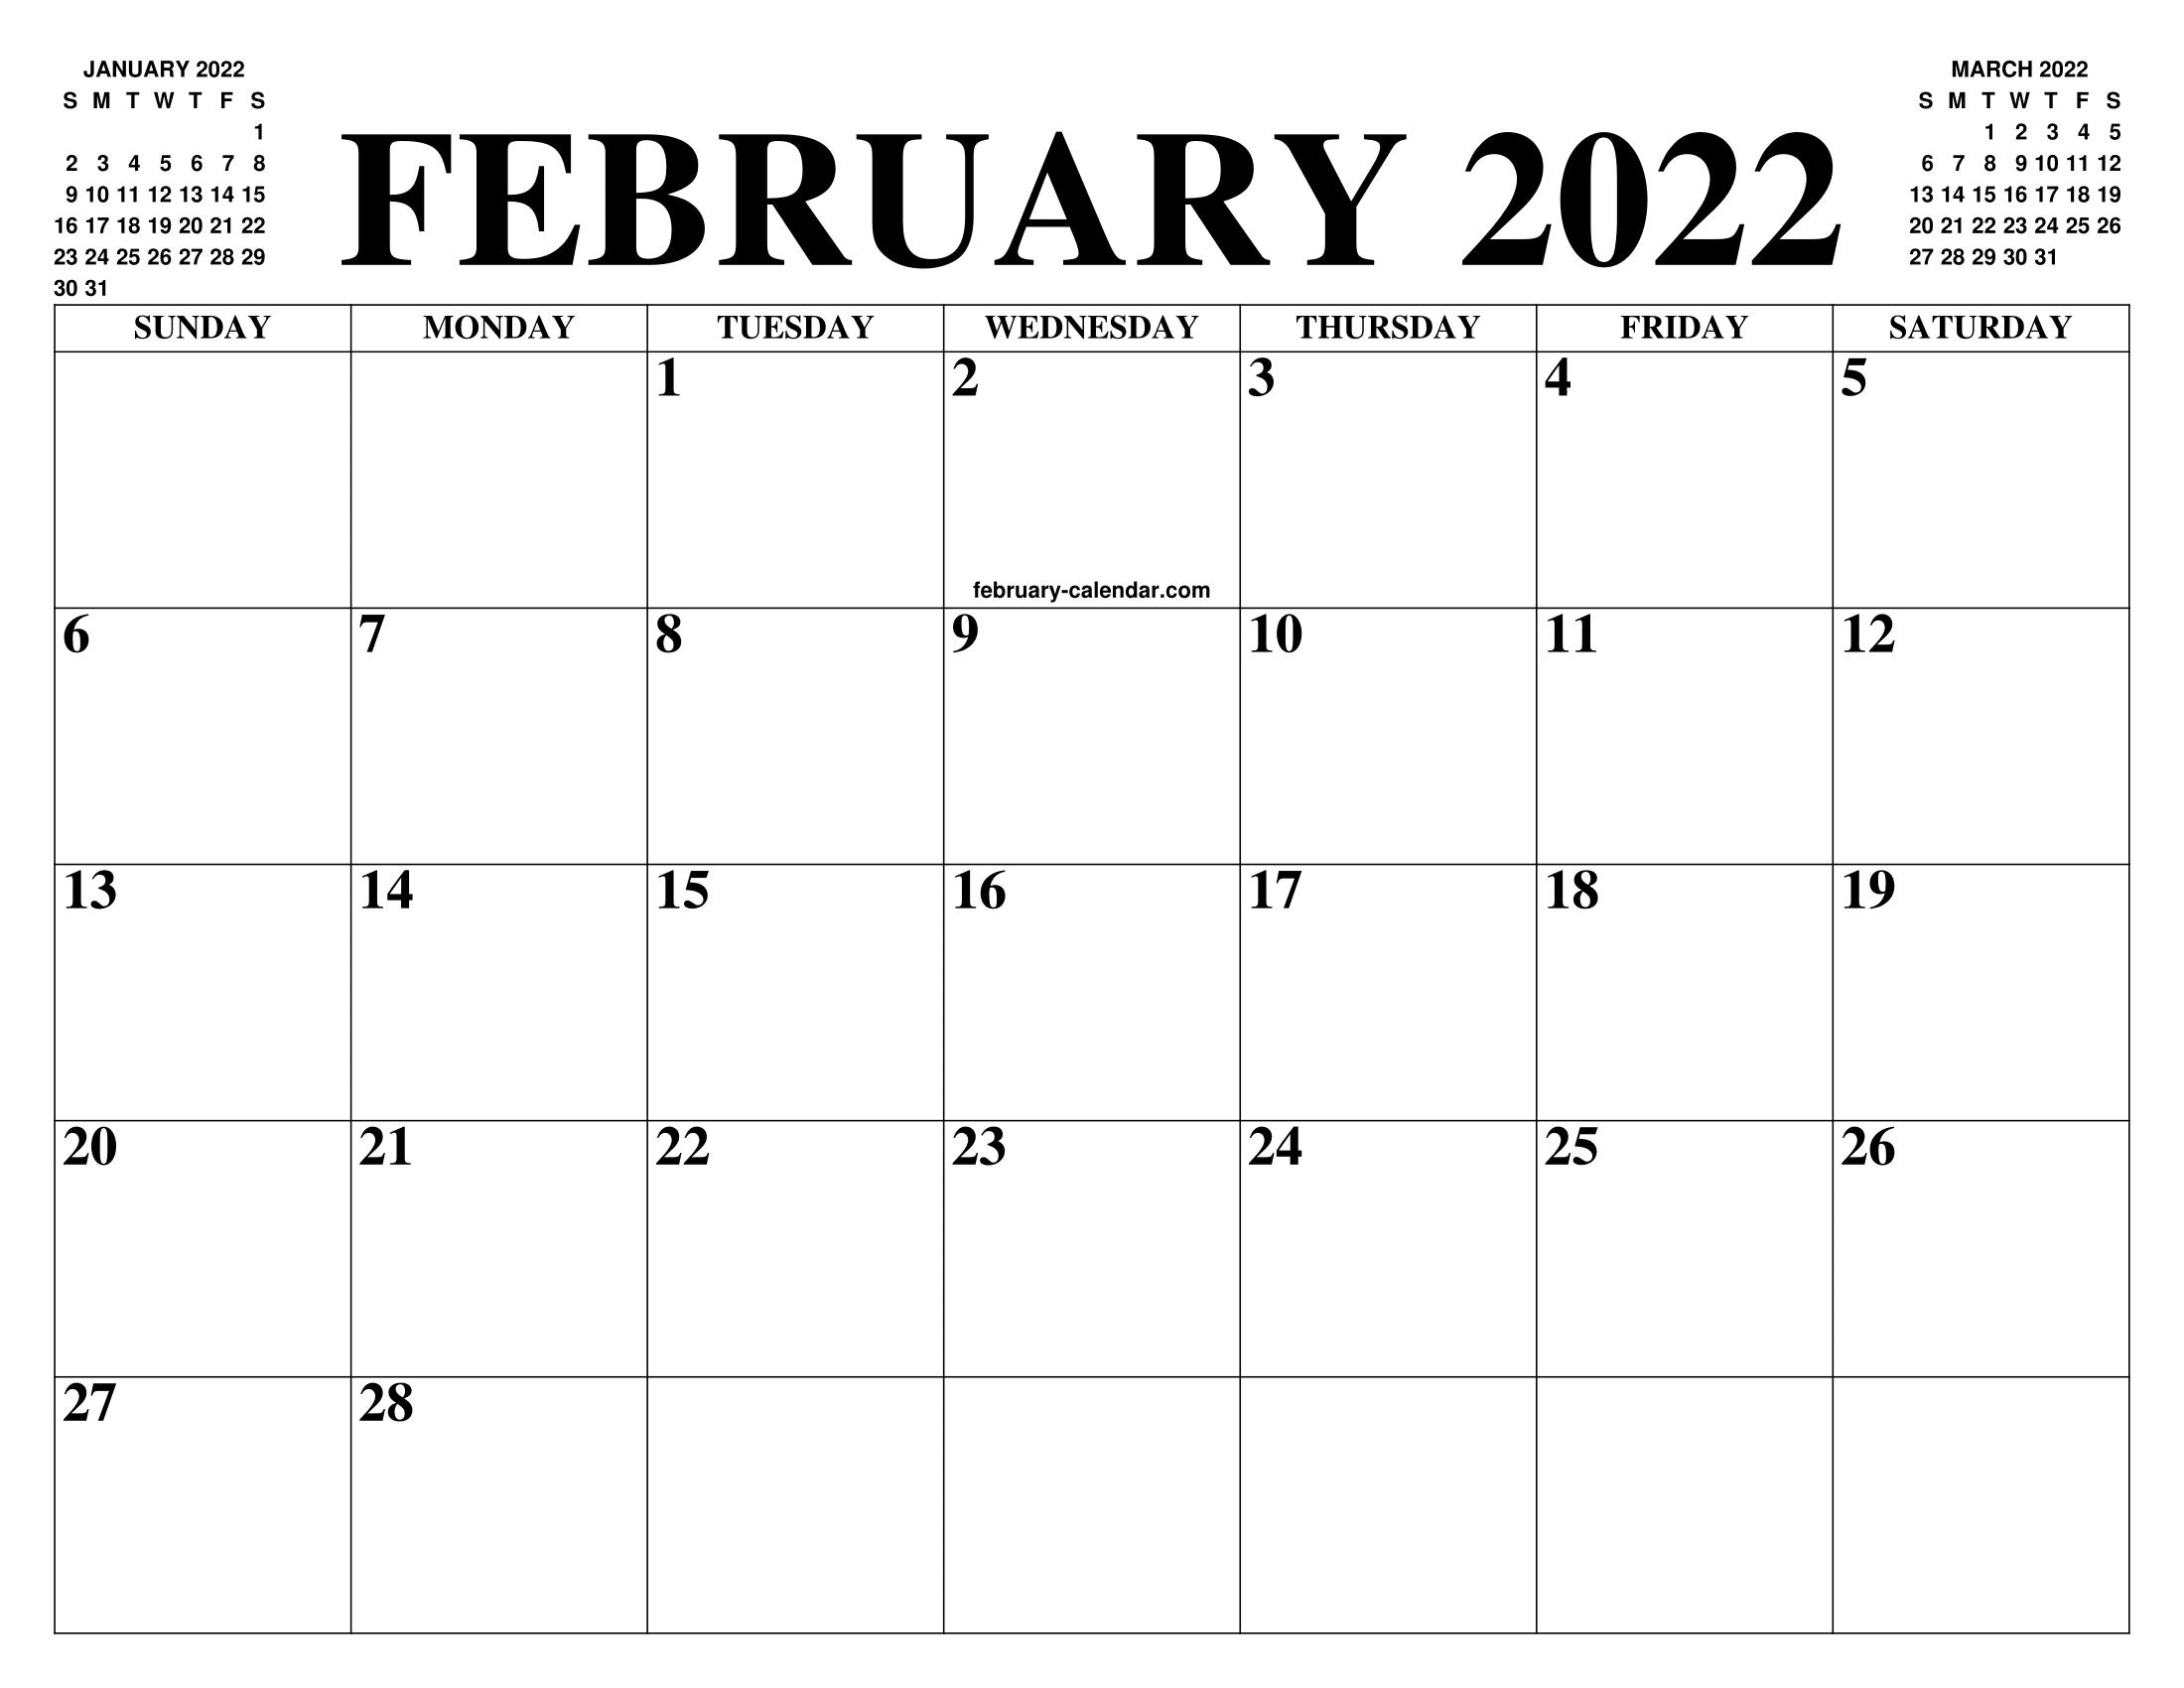 Calendar 2022 Feb.February 2022 Calendar Of The Month Free Printable February Calendar Of The Year Agenda